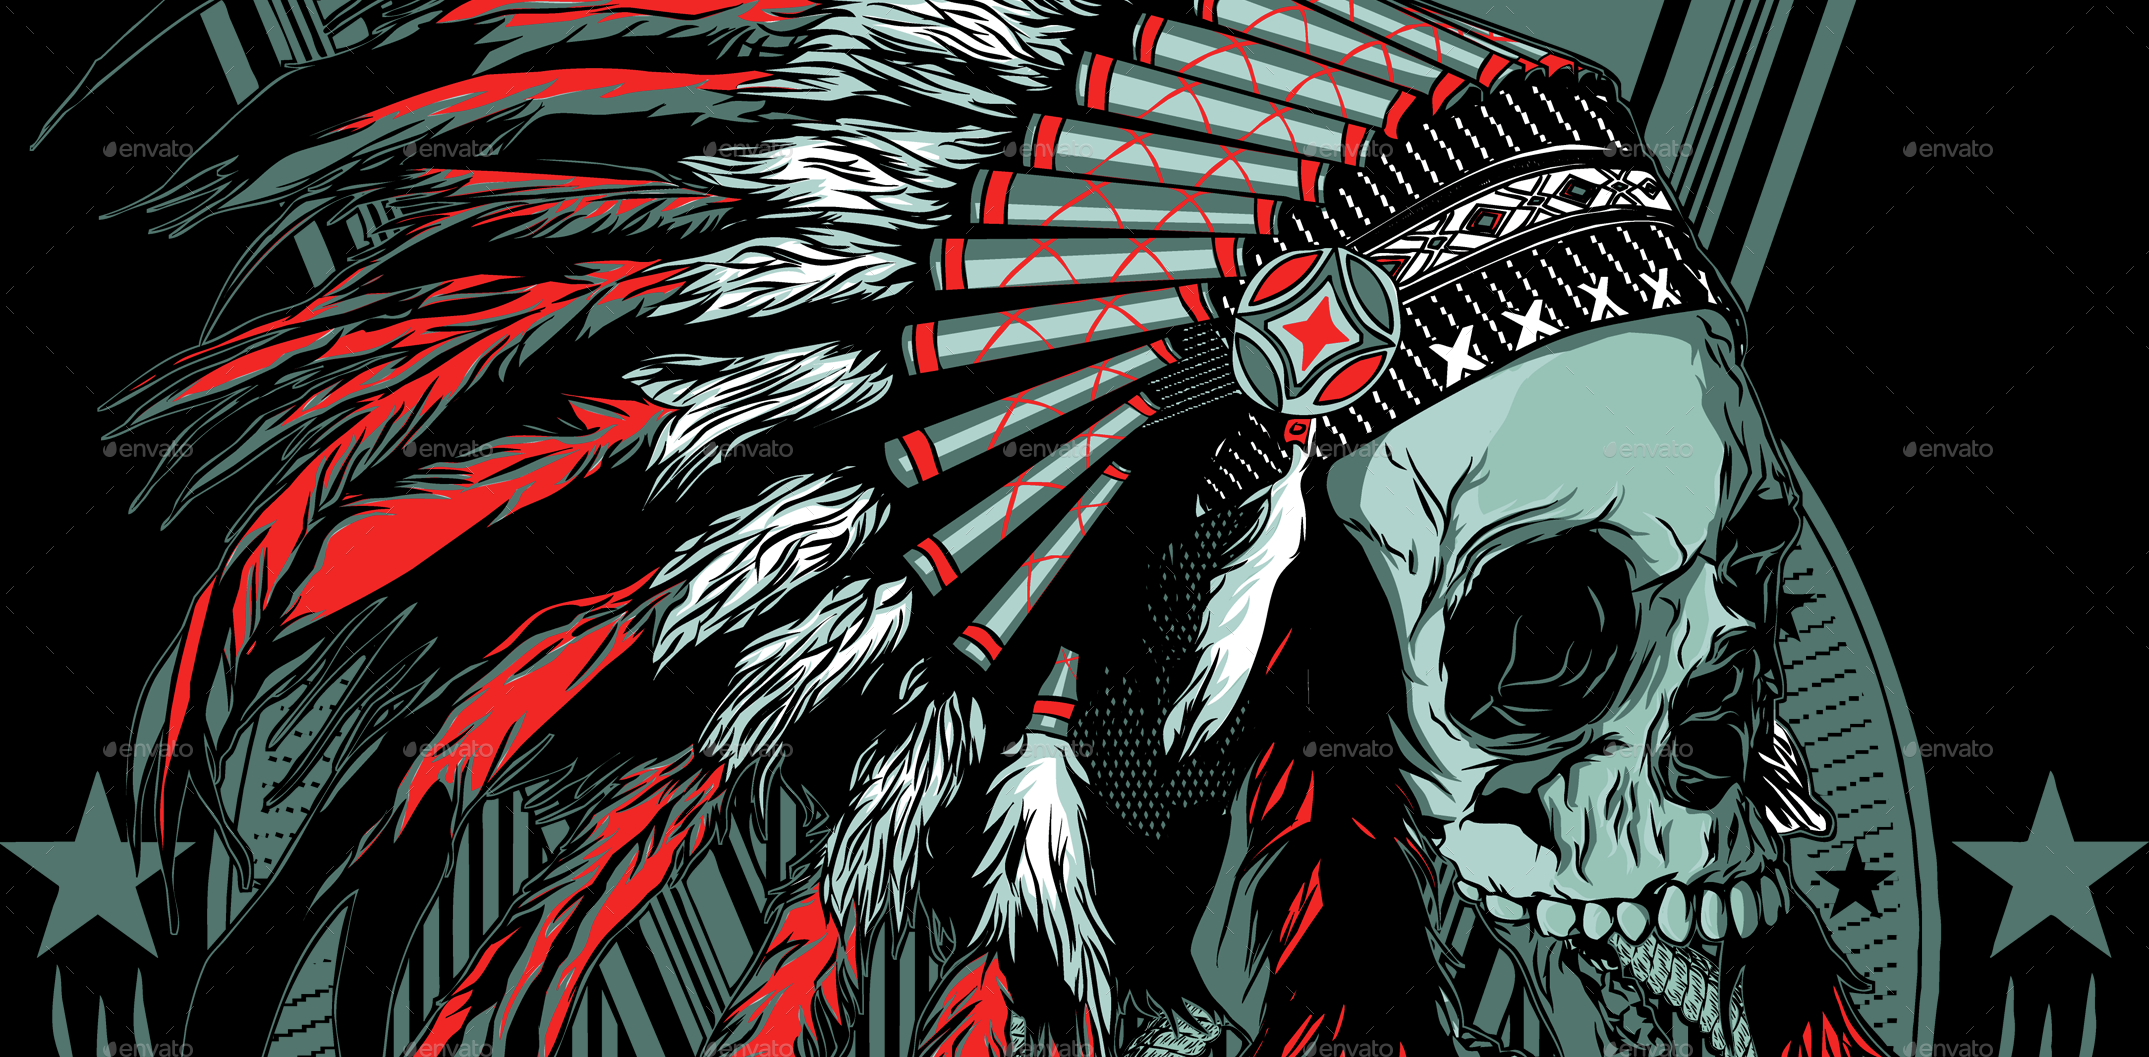 Design t shirt skull - Indian Skull T Shirt Design T Shirts Preview Set 01_preview Png Preview Set 02_preview Png Preview Set 03_preview Png